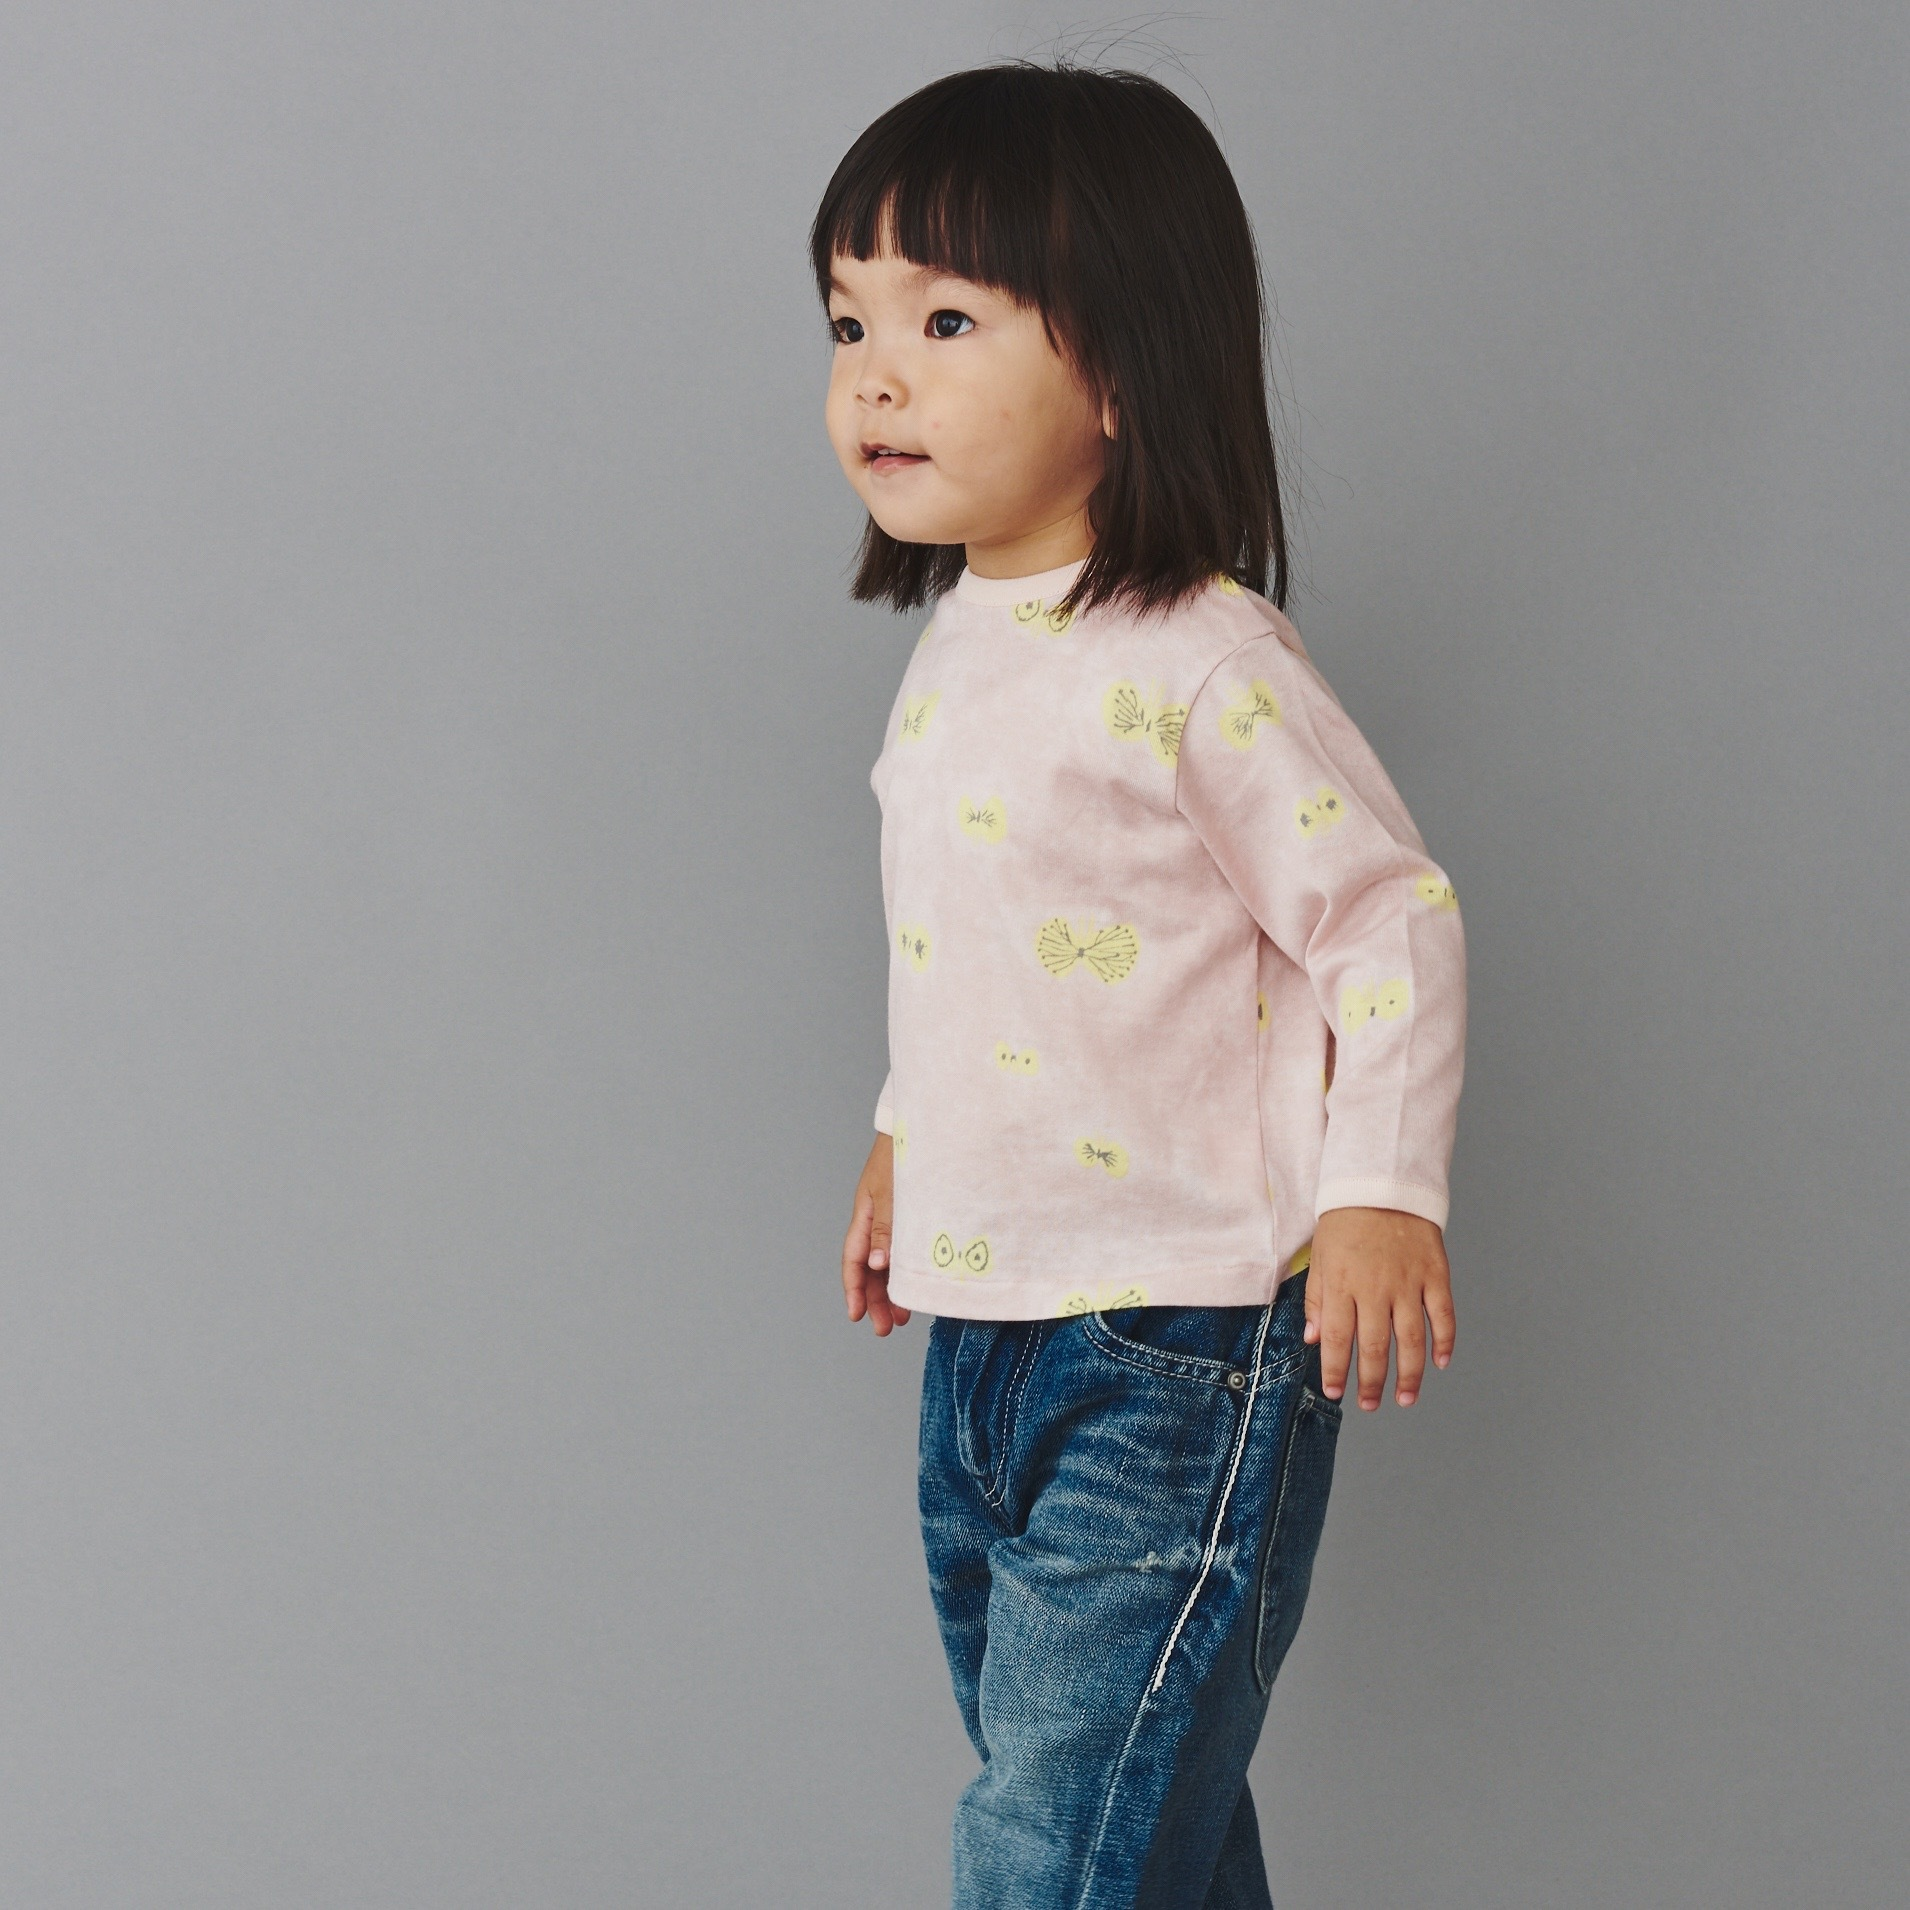 《mina perhonen 2019AW》hana hane 長袖カットソー / light pink